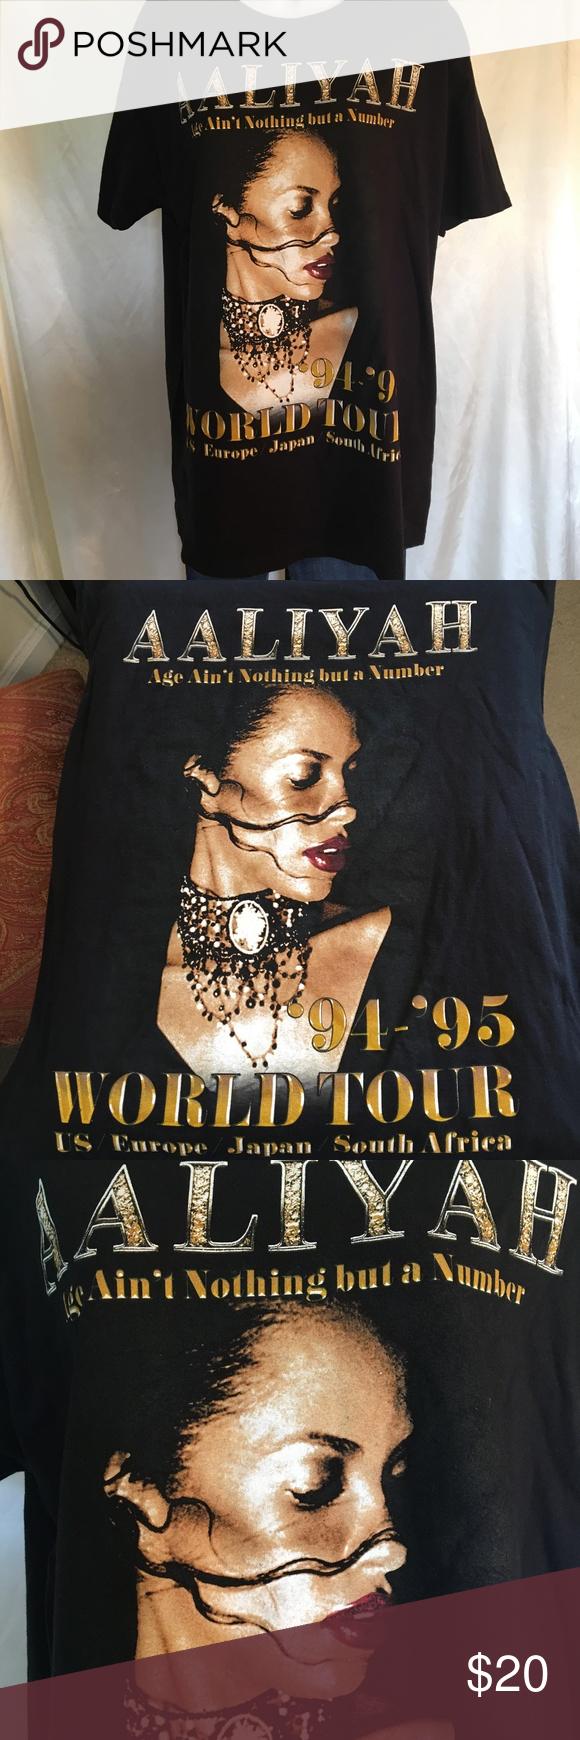 4f6a2bbd5c6b9 Aaliyah 94  - 95  World Tour Reproduction Tee Aaliyah 94  - 95 ...